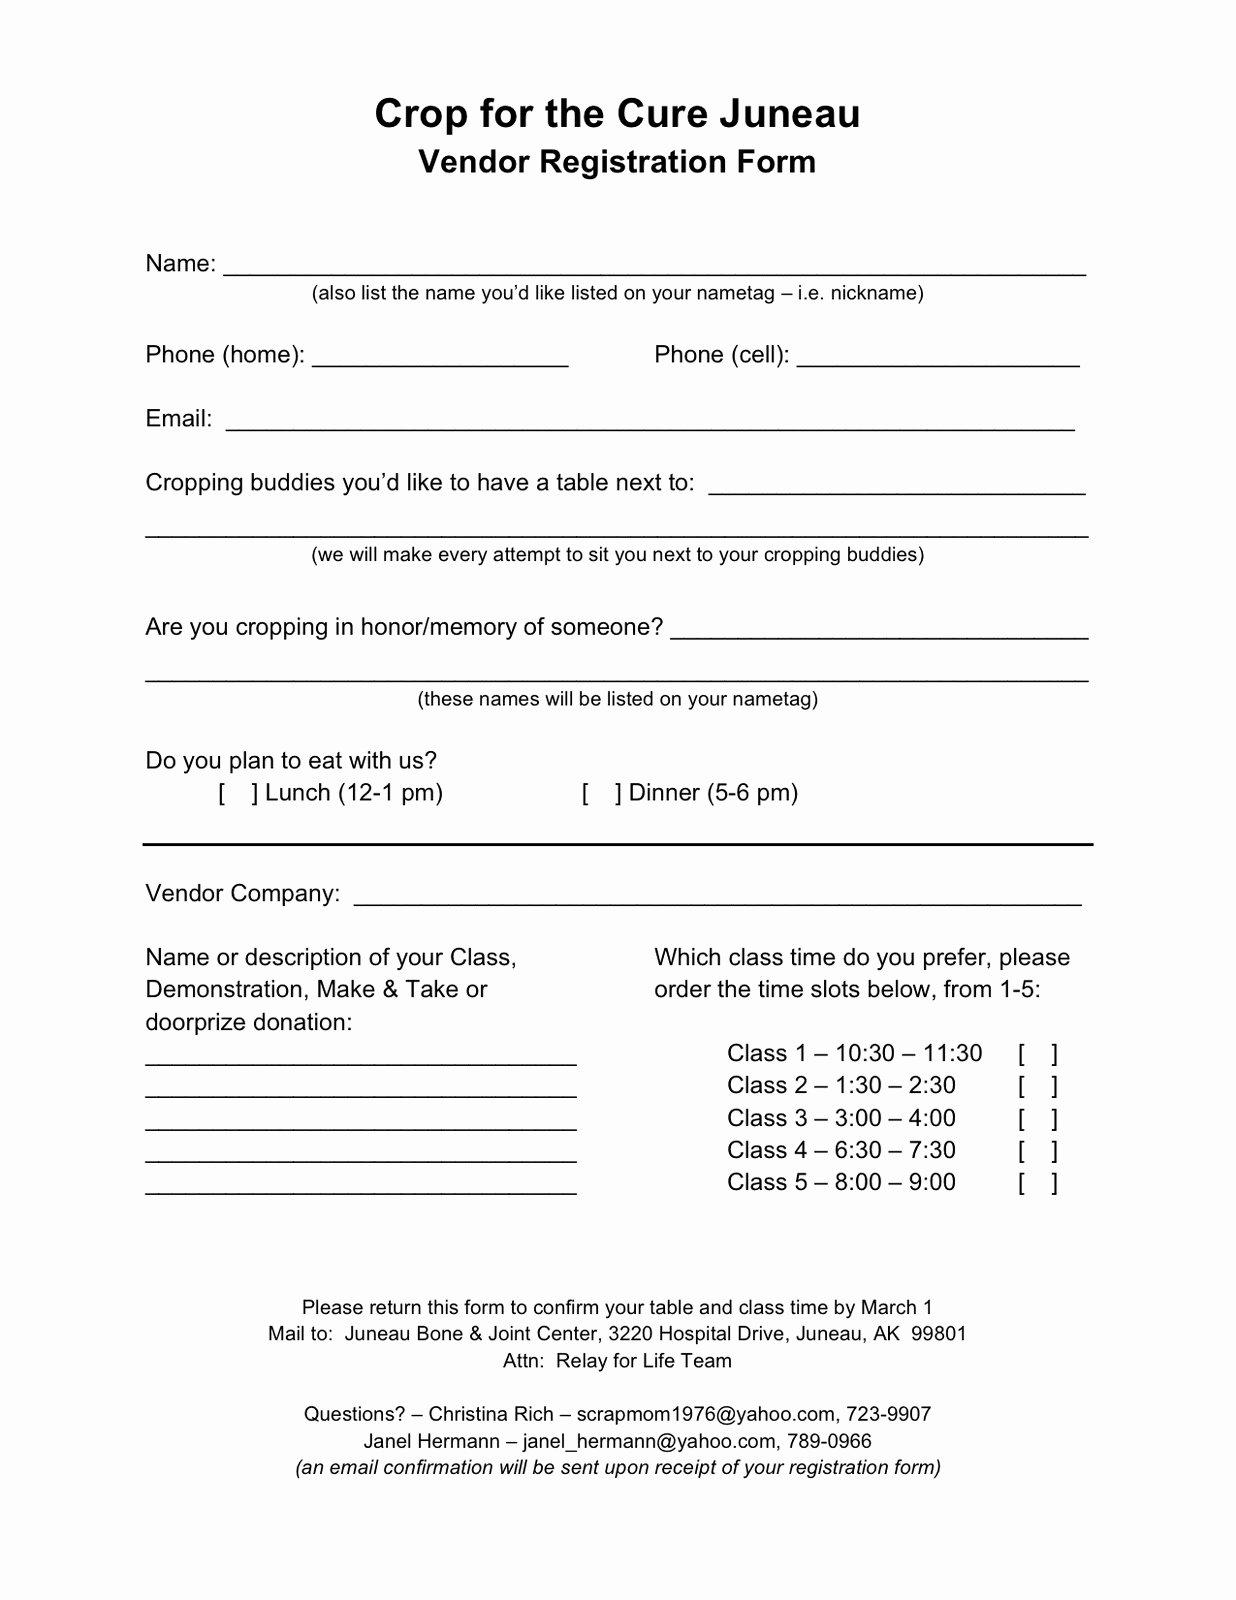 Vendor Application form Template Elegant form Vendor Registration form